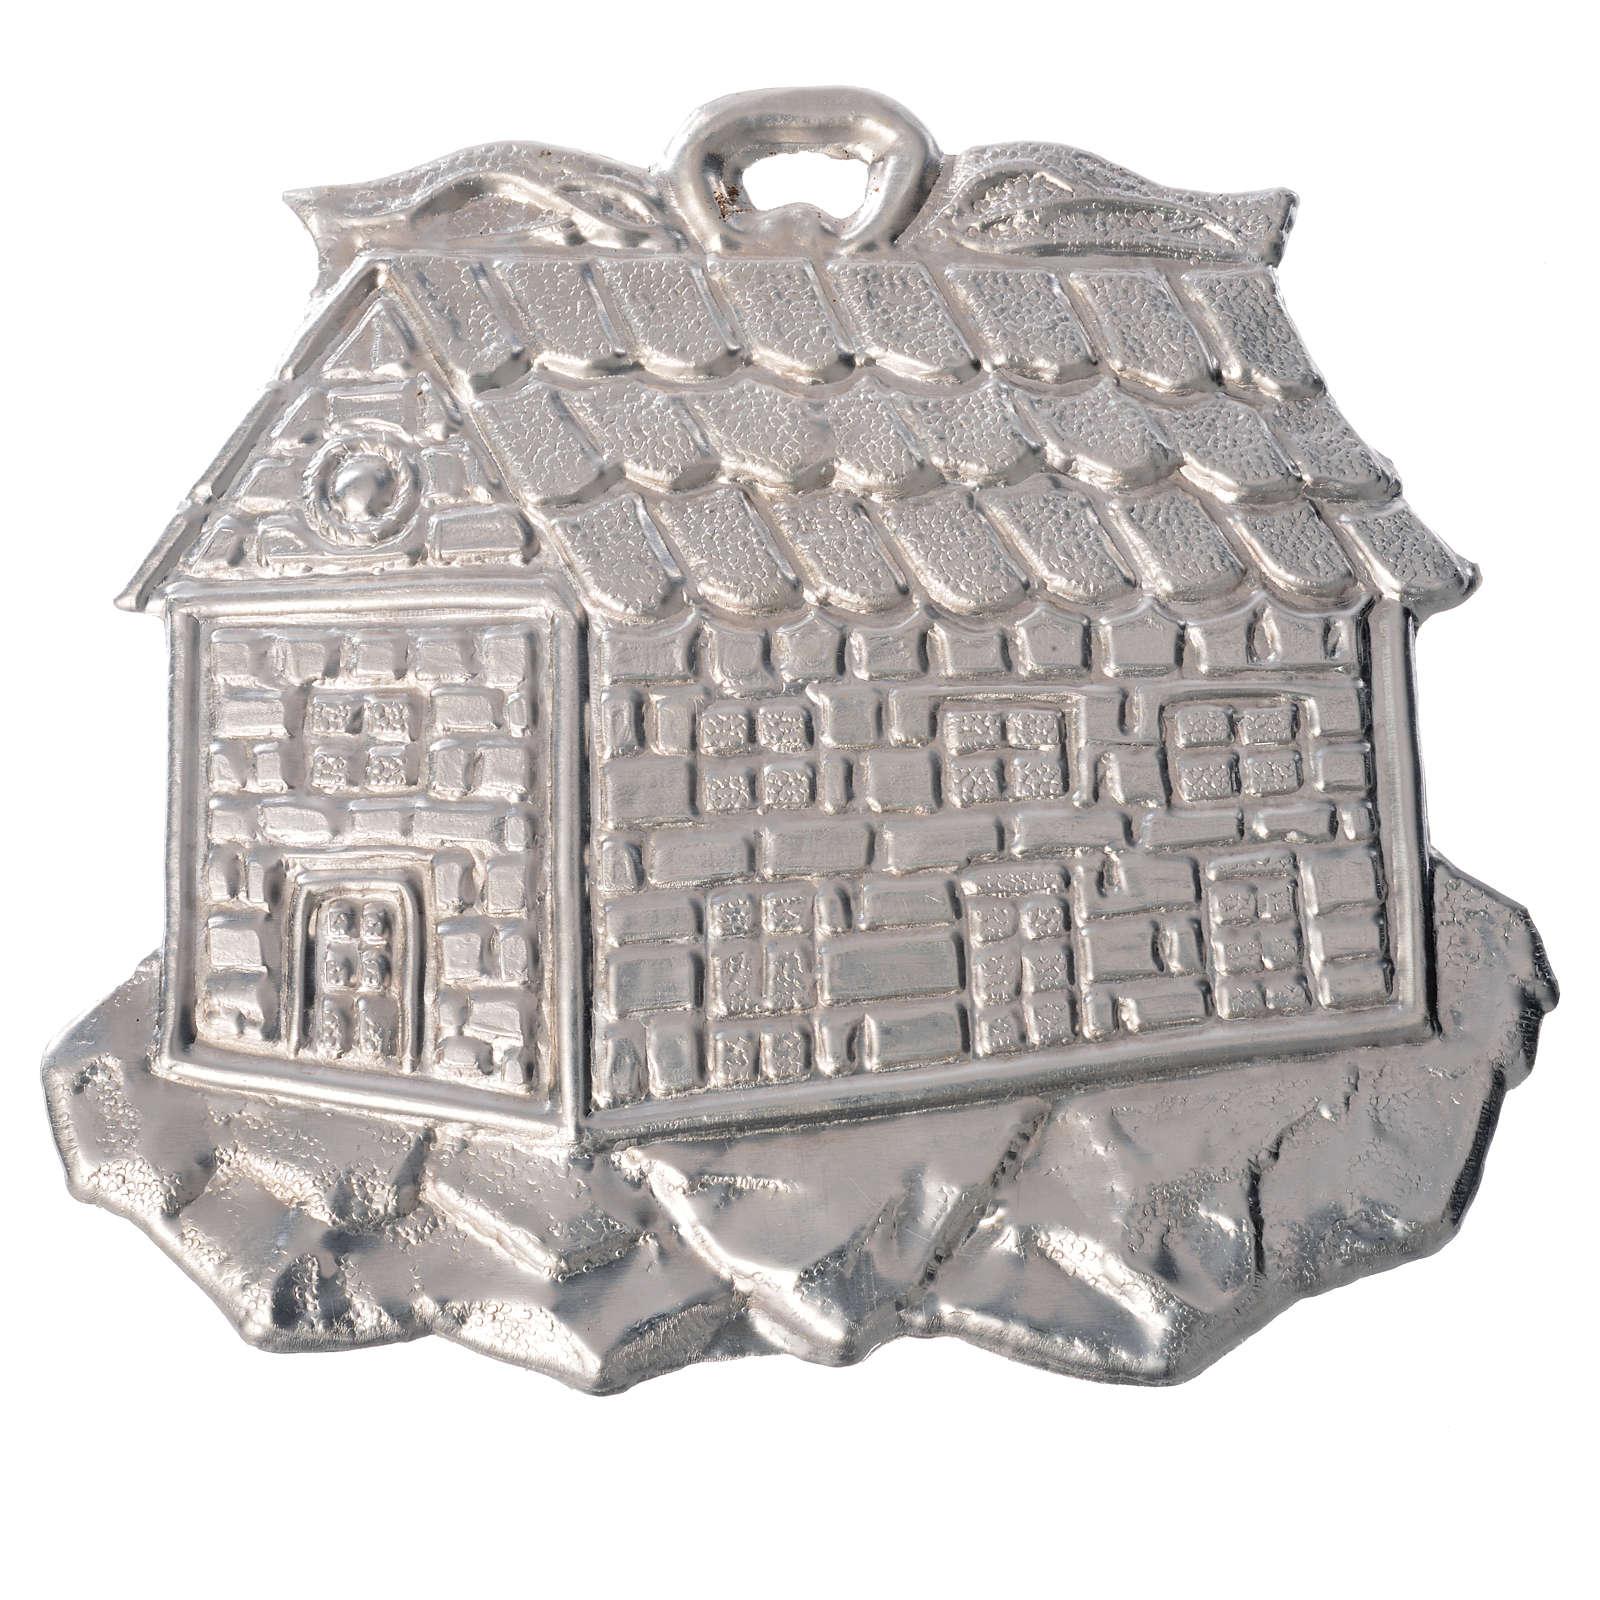 Ex-voto casita plata 925 o metal 8.5 x 10 cm. 3